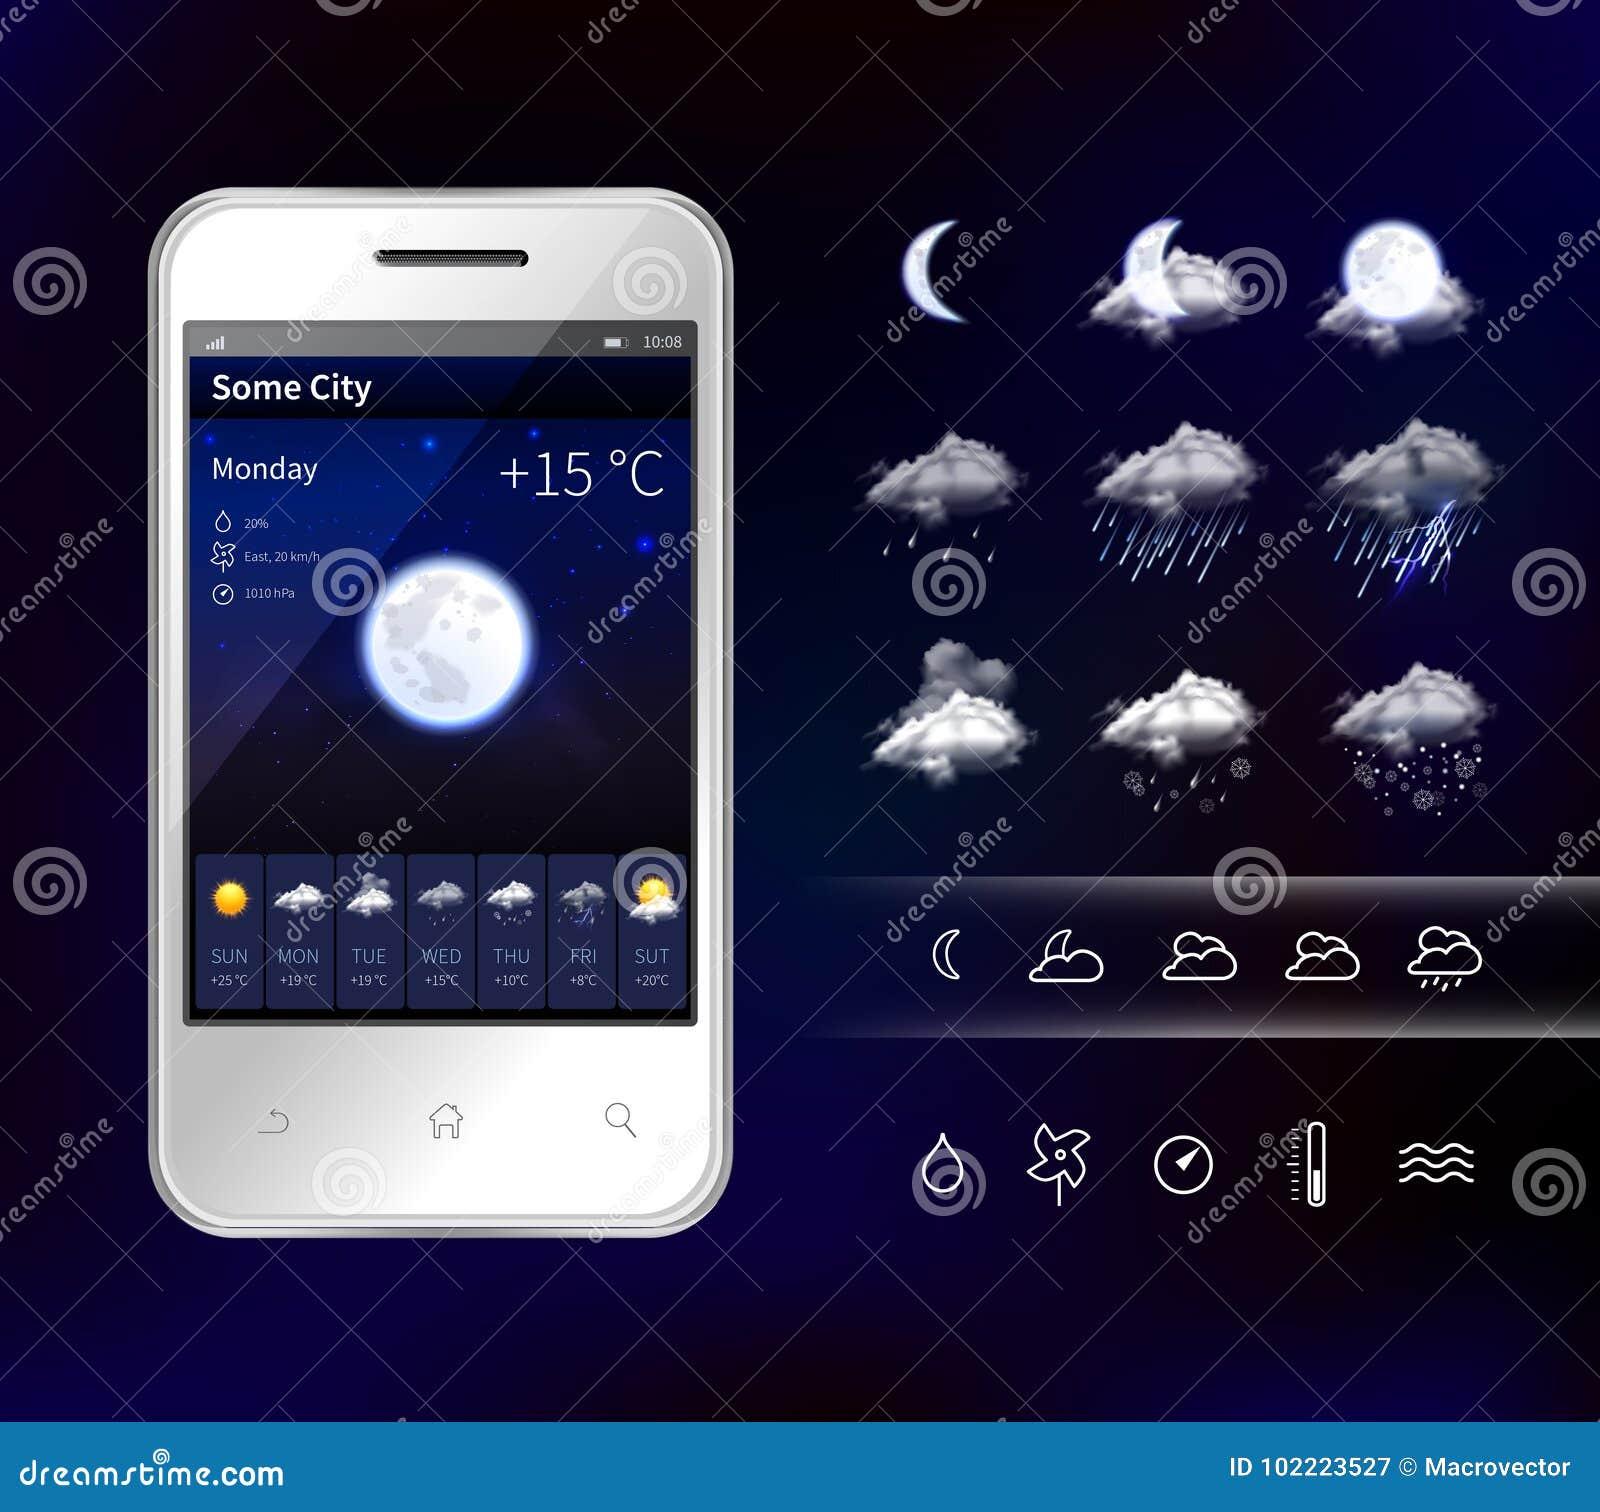 Smartphone Mobile Weather Realistic Image